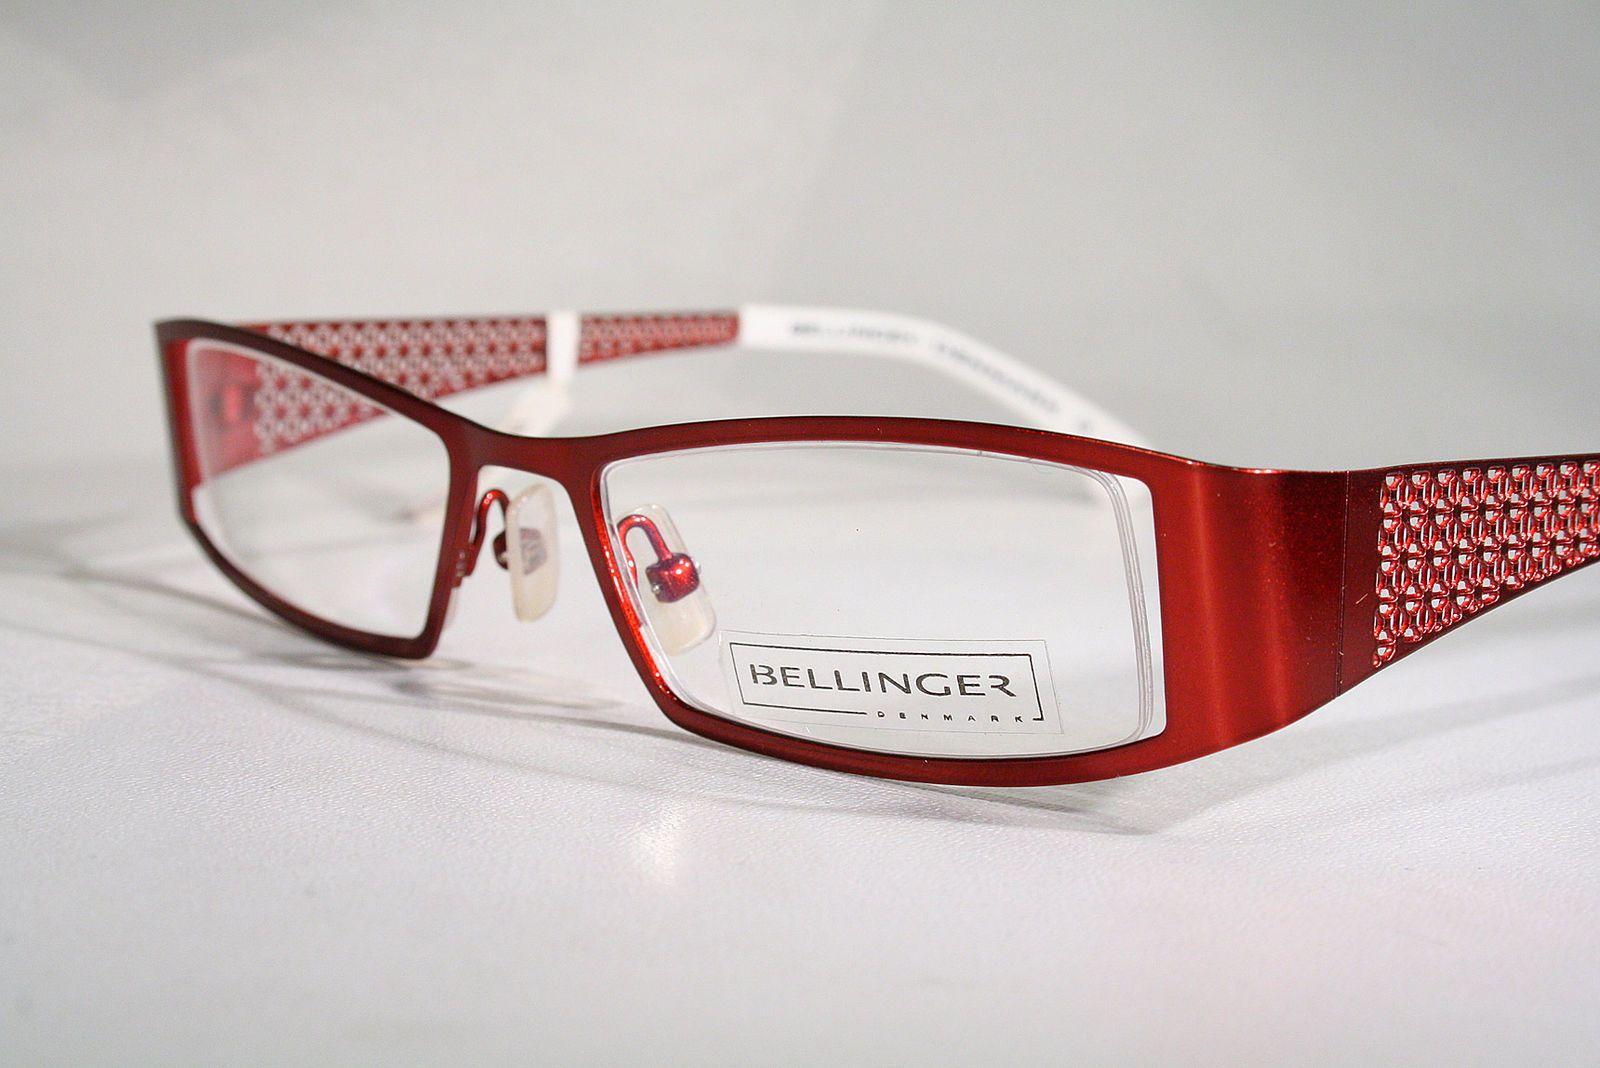 a3617cb91dd BELLINGER Metallic Candy Red Danish Design Semi Rimless Eyeglass Frames  Large